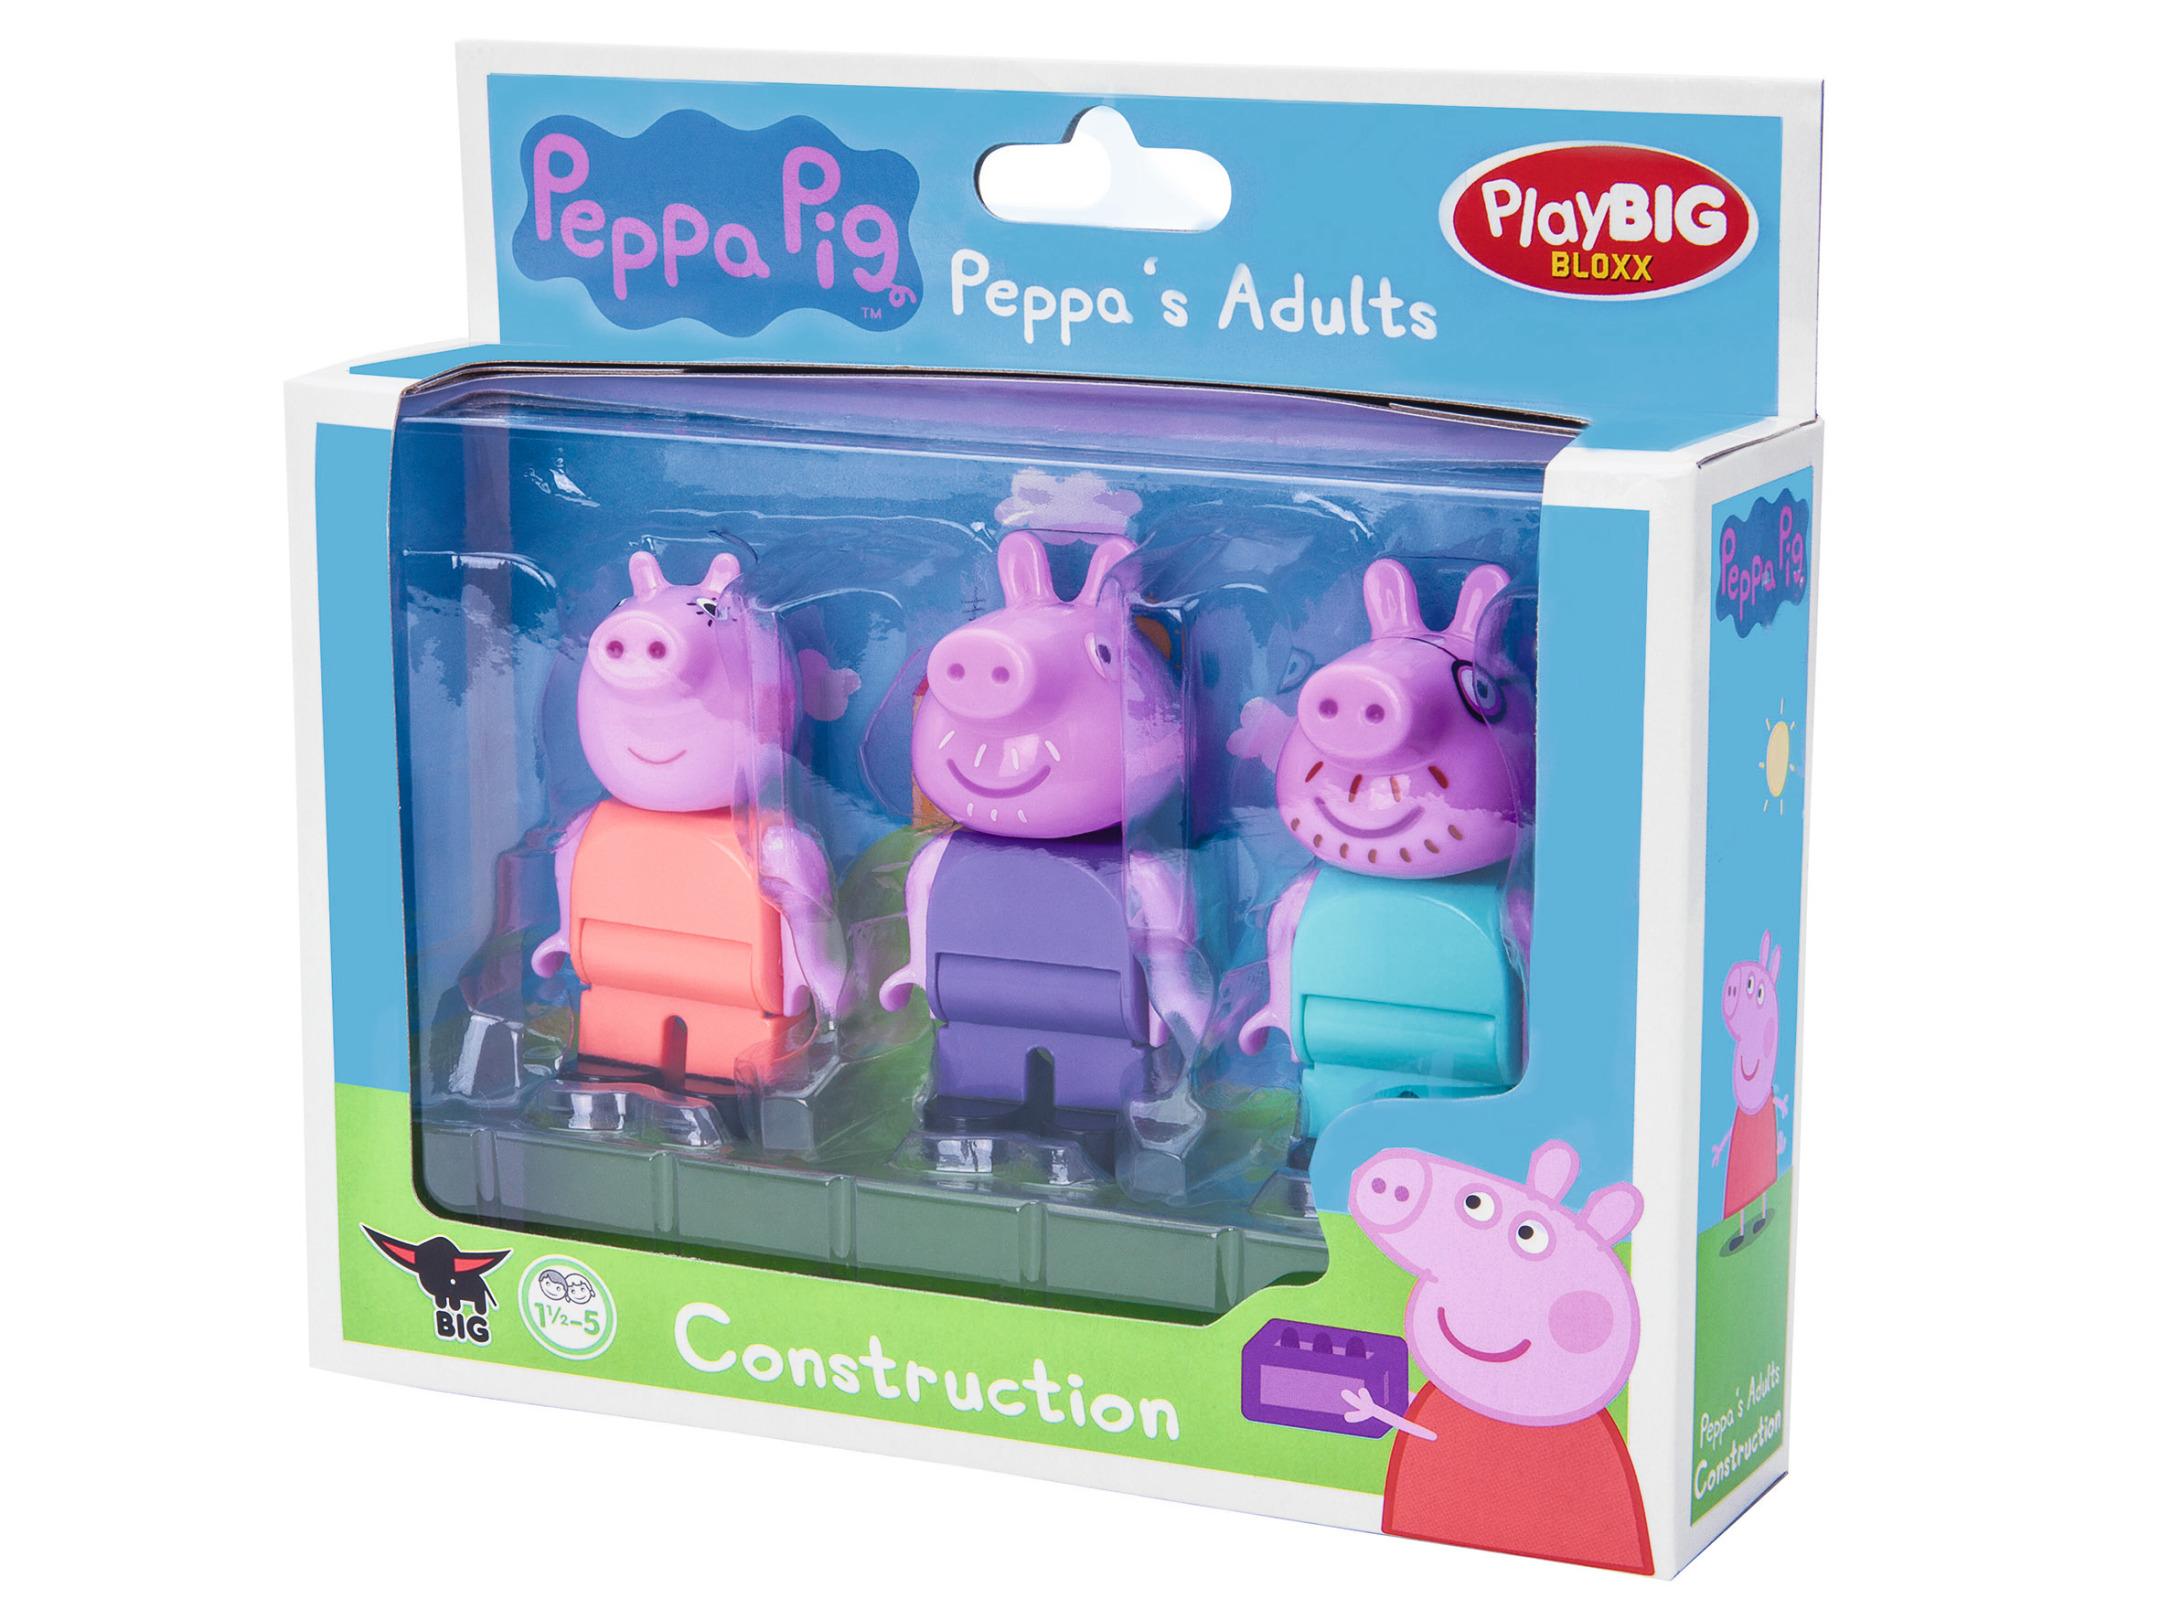 playbig bloxx peppa pig - peppa`s adults